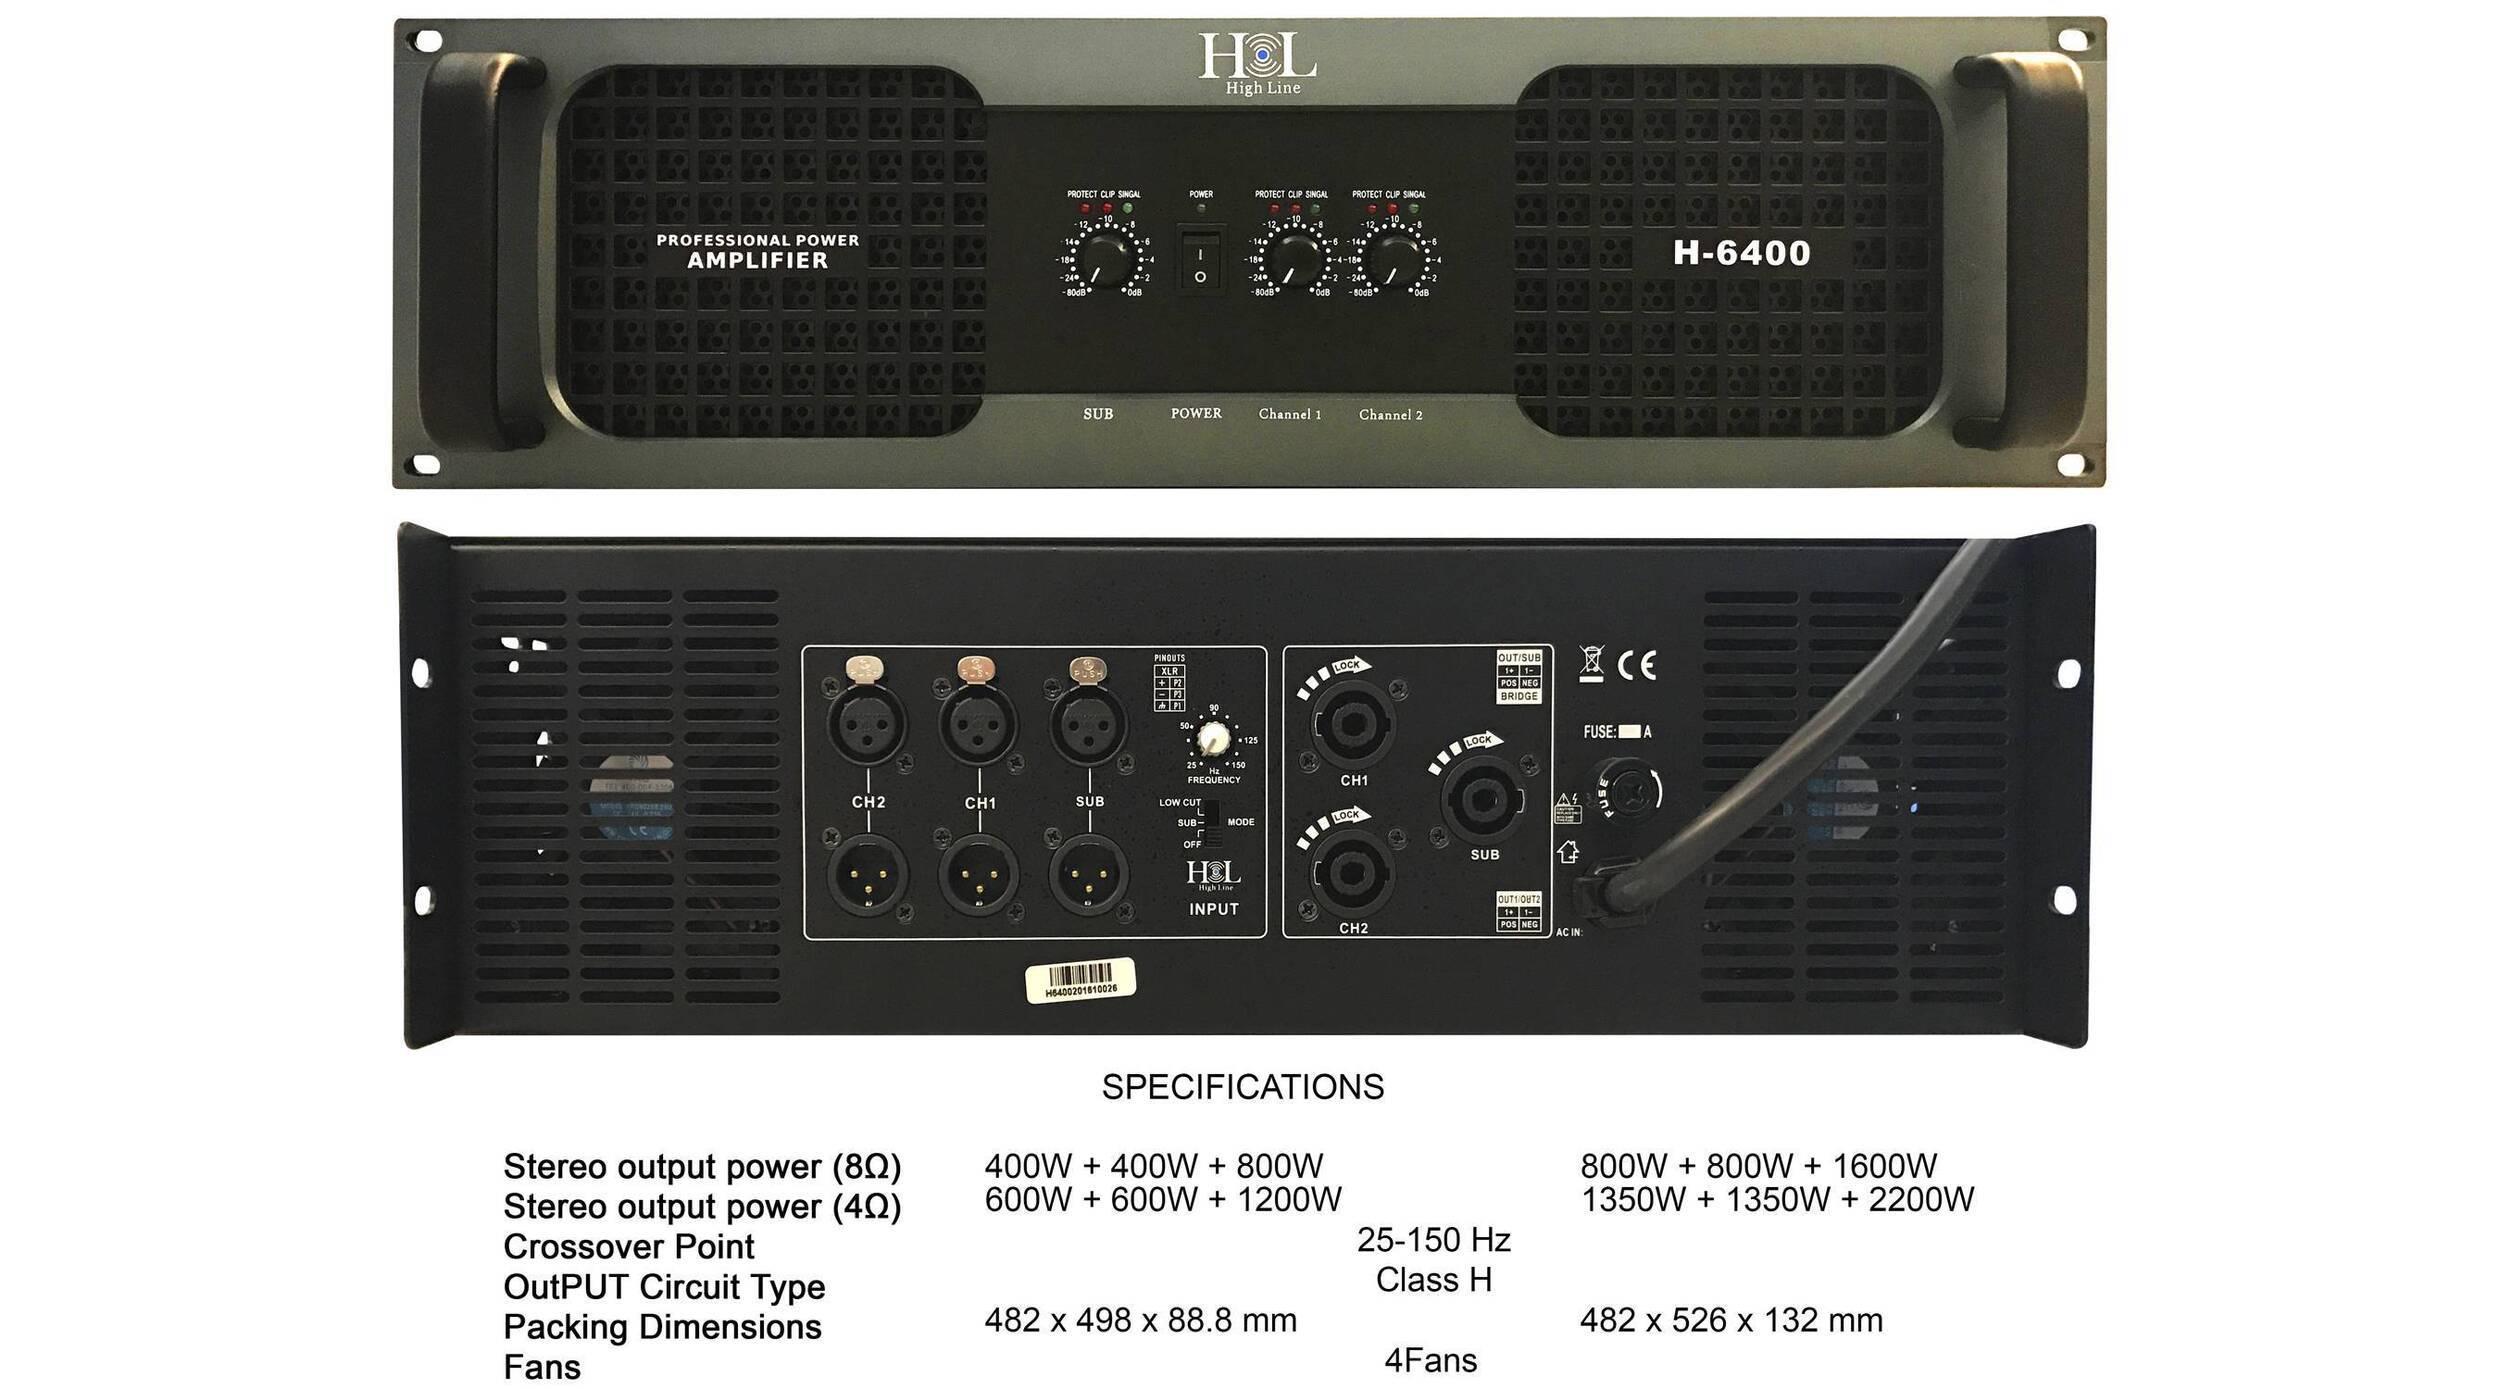 H-4800